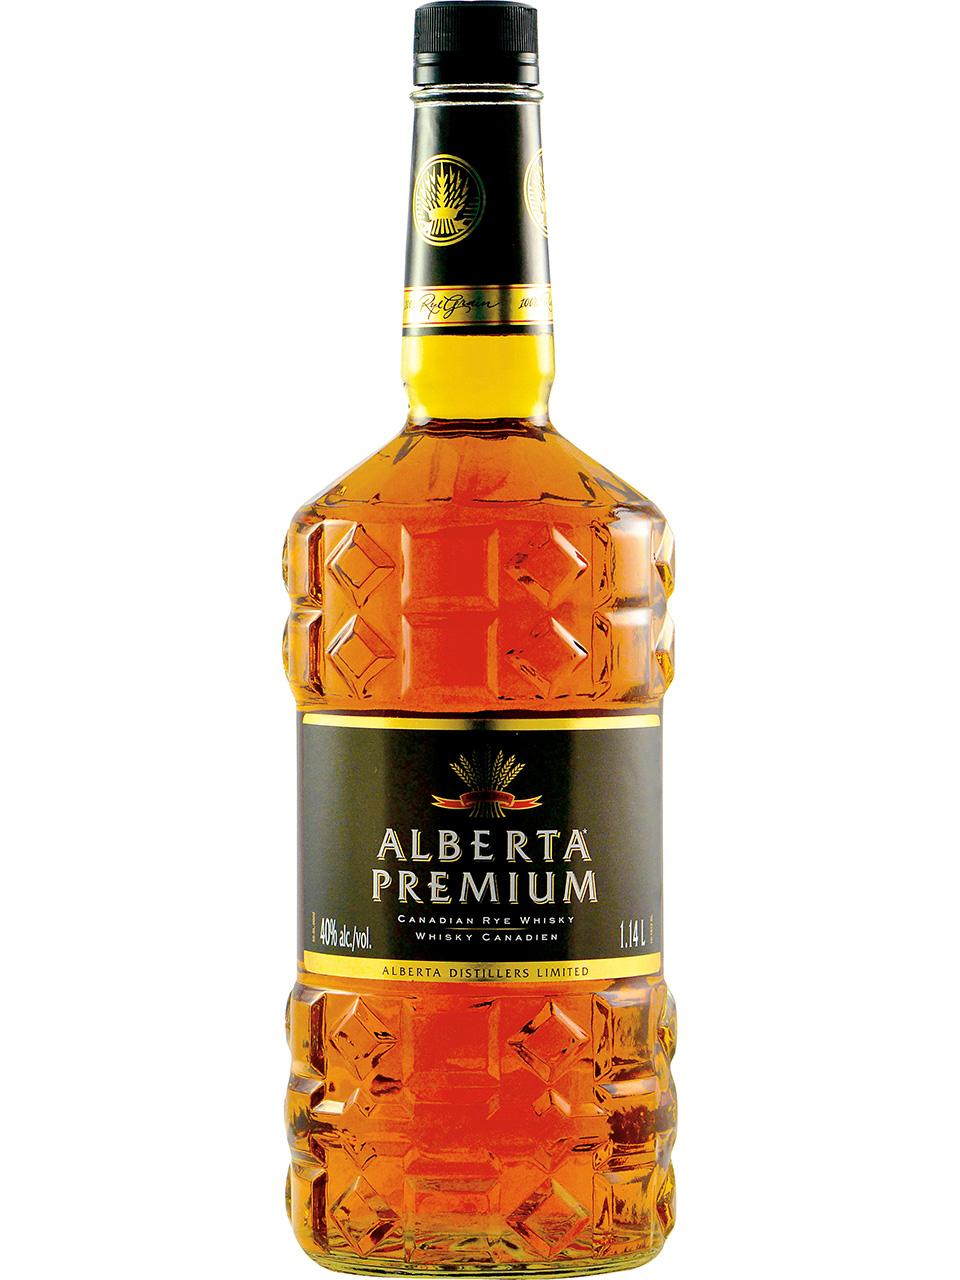 Alberta Premium Whisky